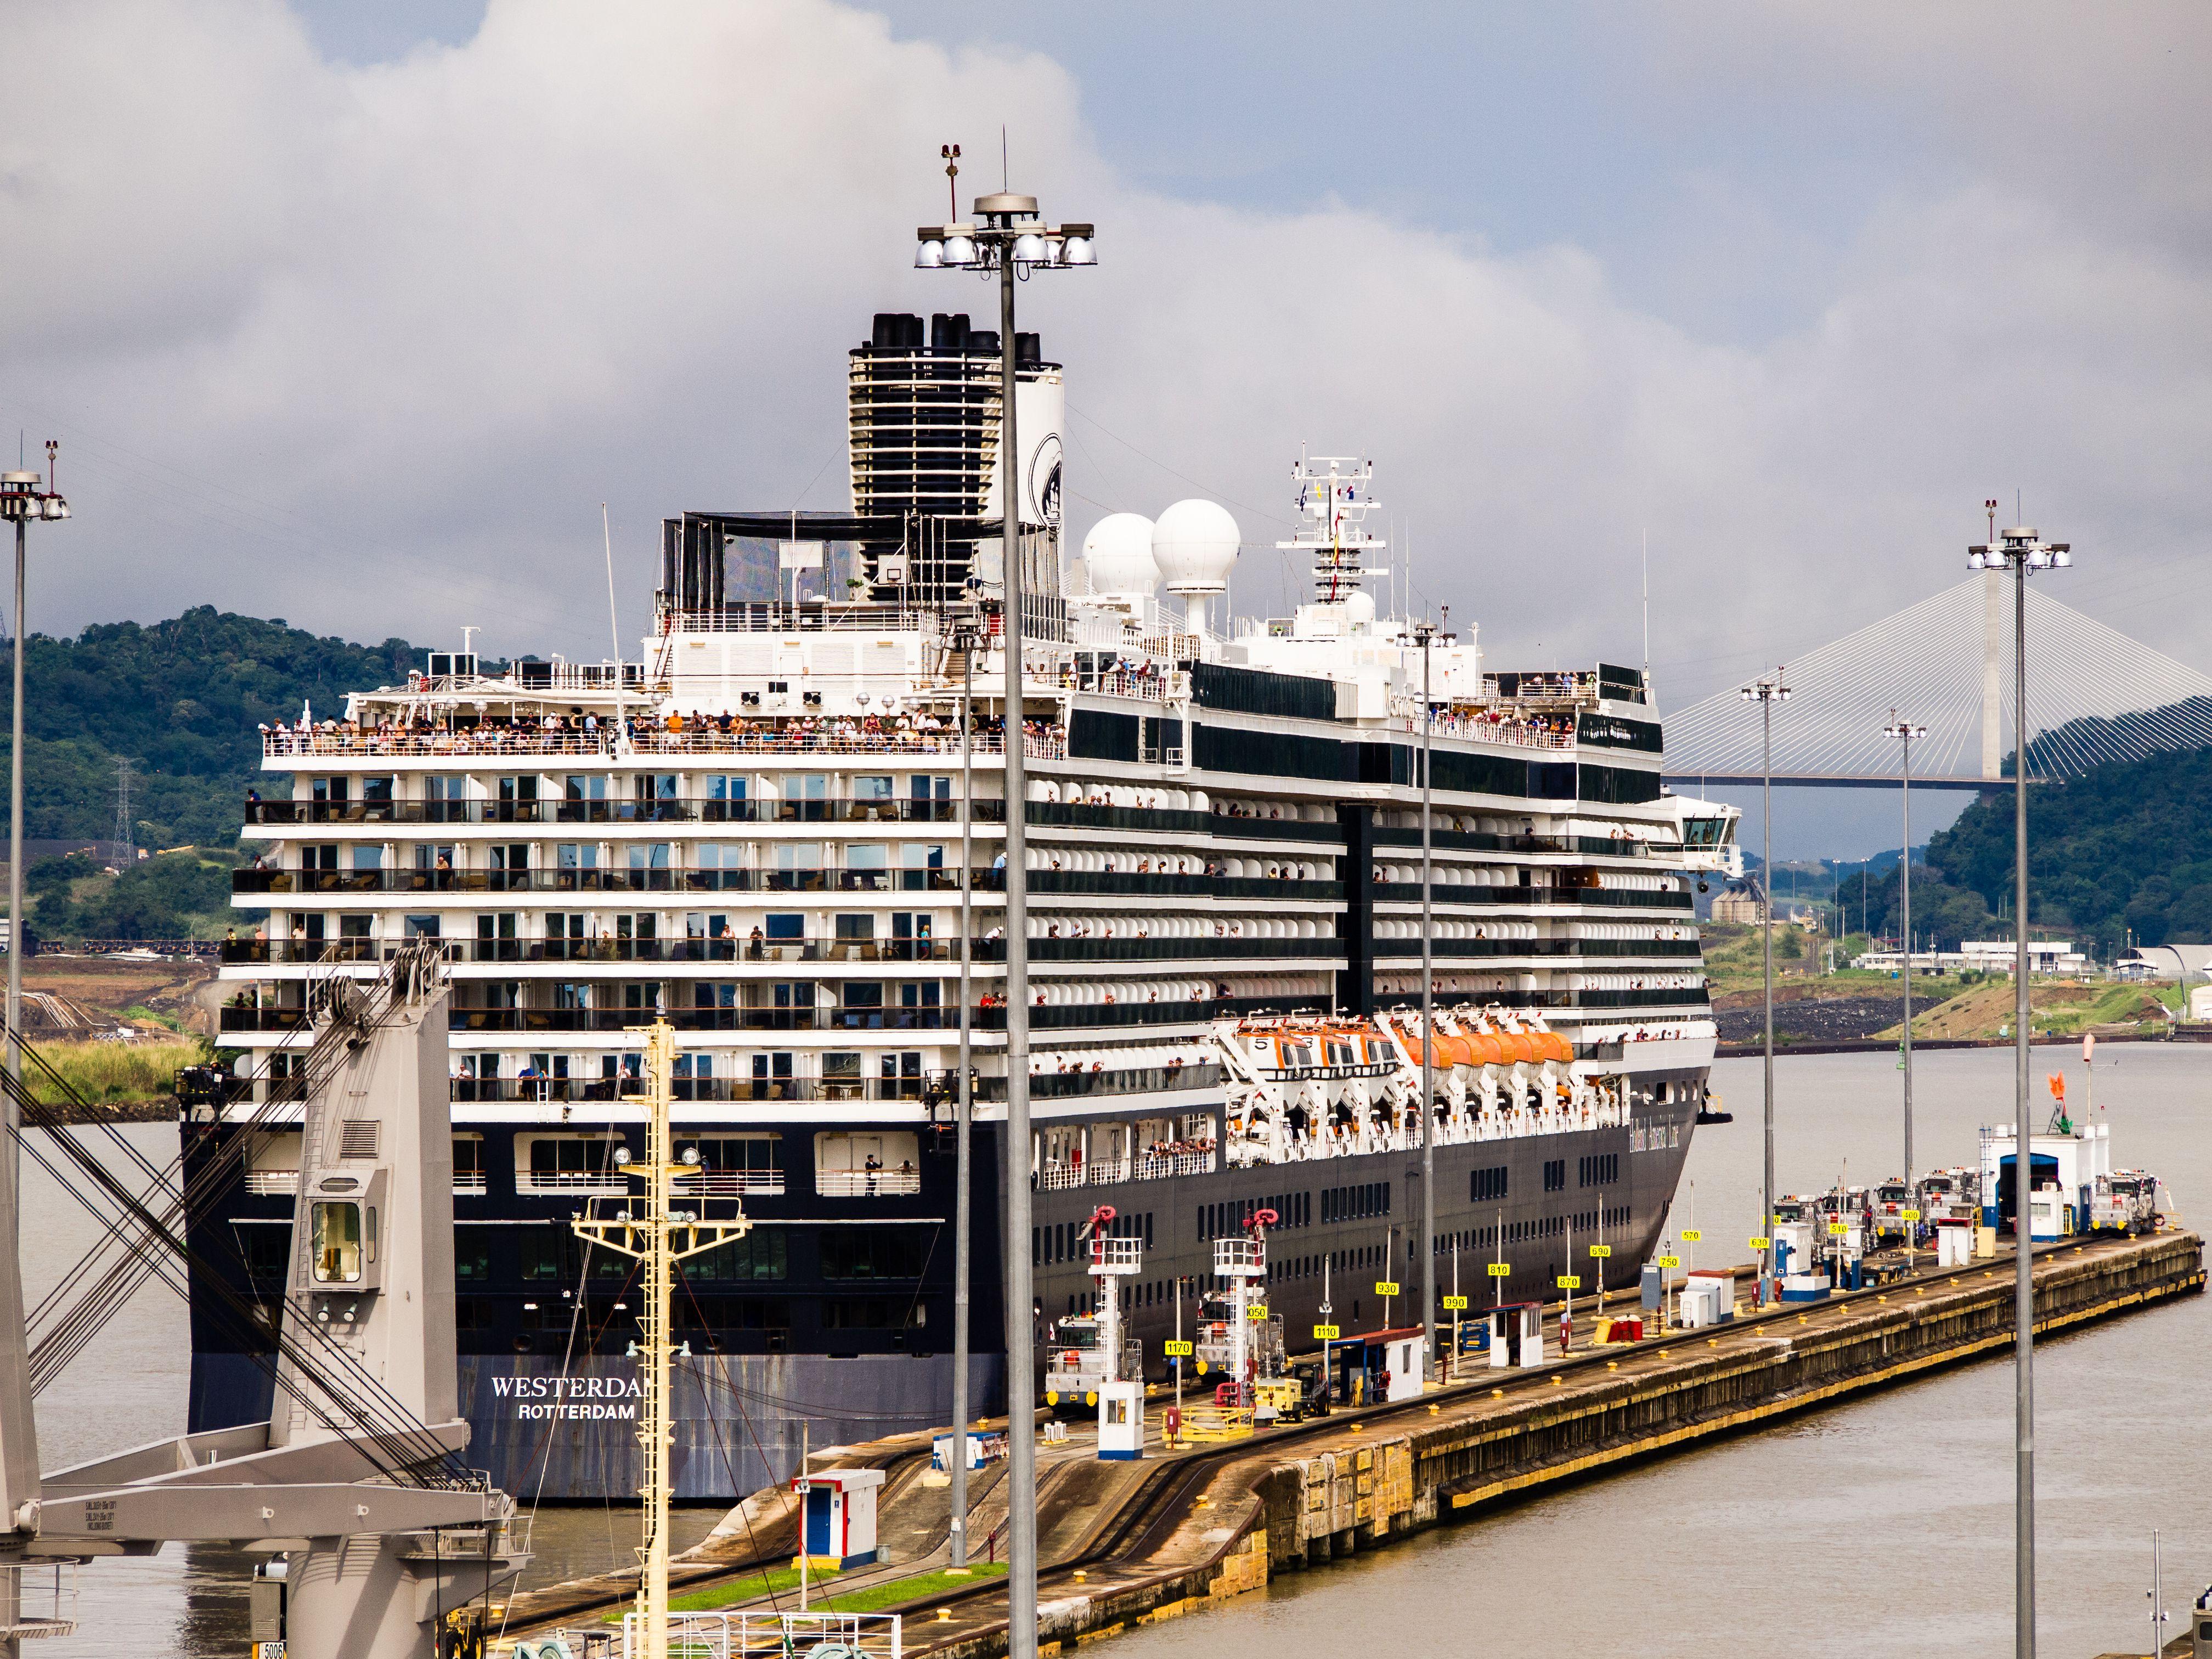 Cruise ship Westerdam transiting the Panama Canal